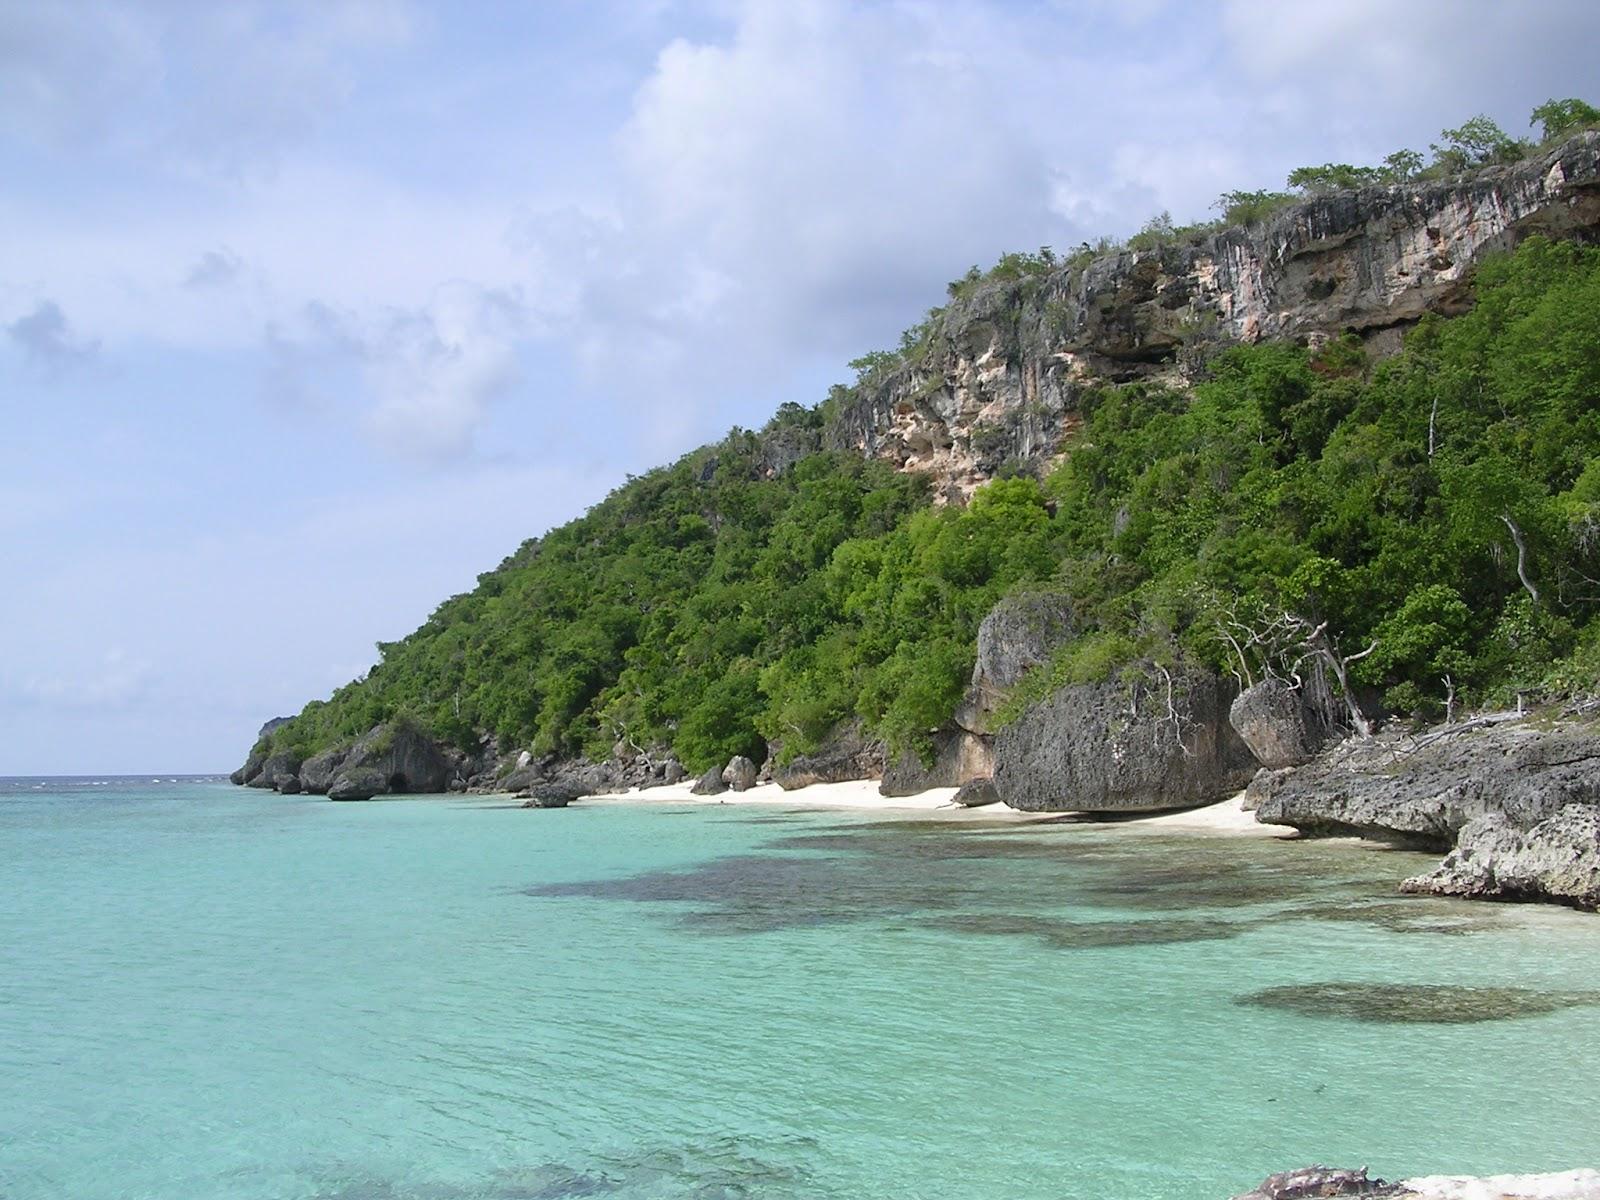 Mona_Island,_Puerto_Rico.JPG